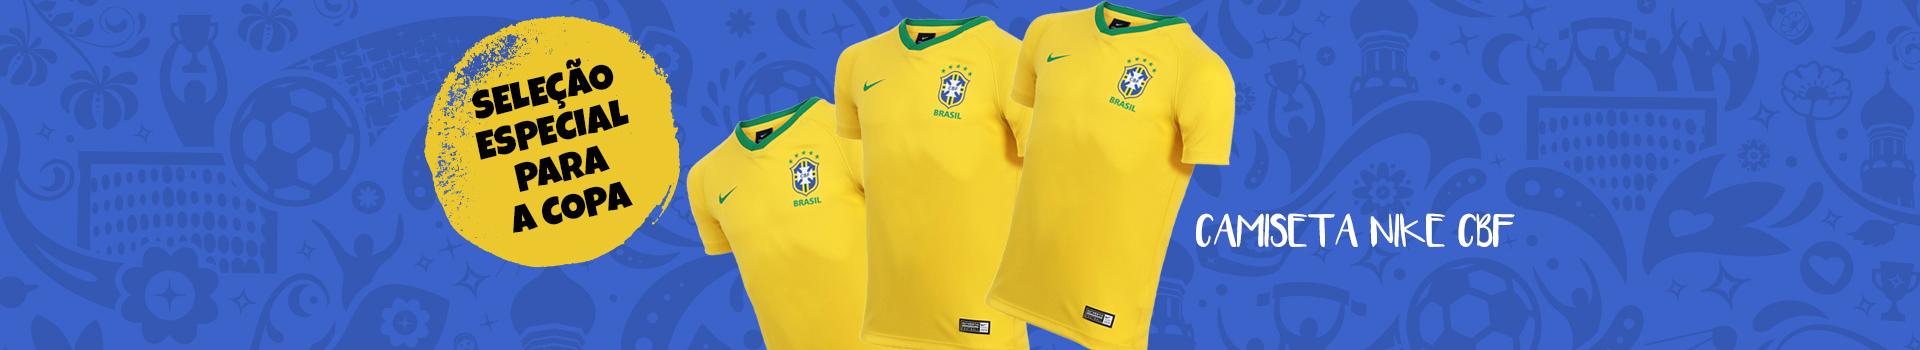 TV3-Camiseta_Nike_CBF